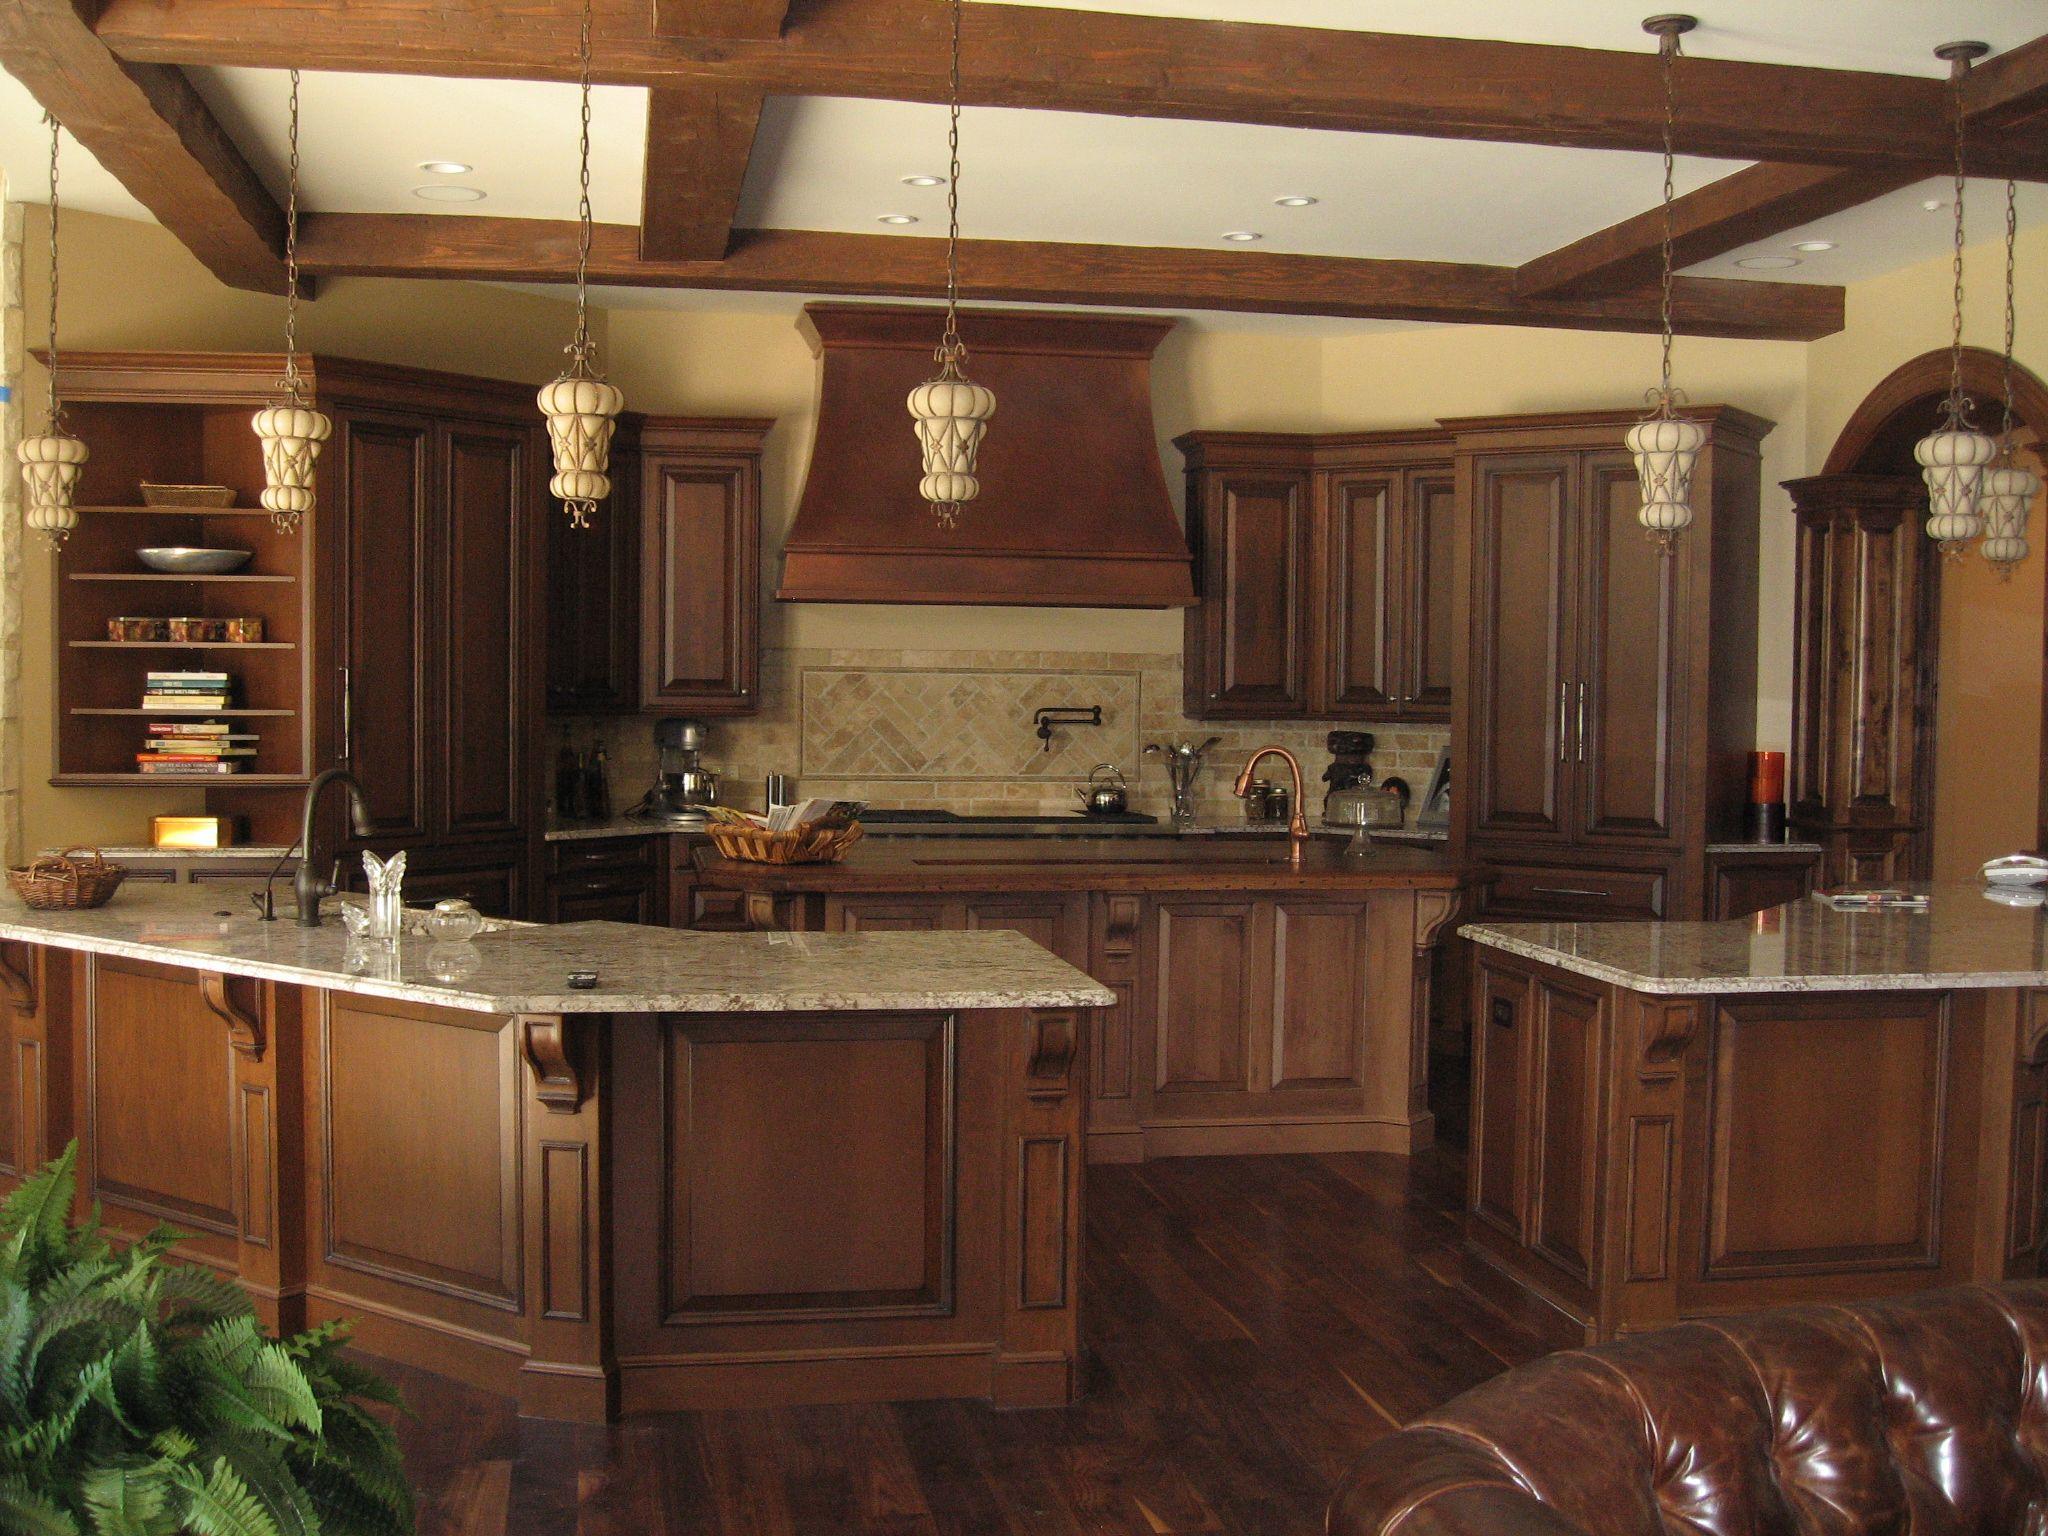 Old World Kitchen By Old Mill Kitchen Design Old World Kitchens